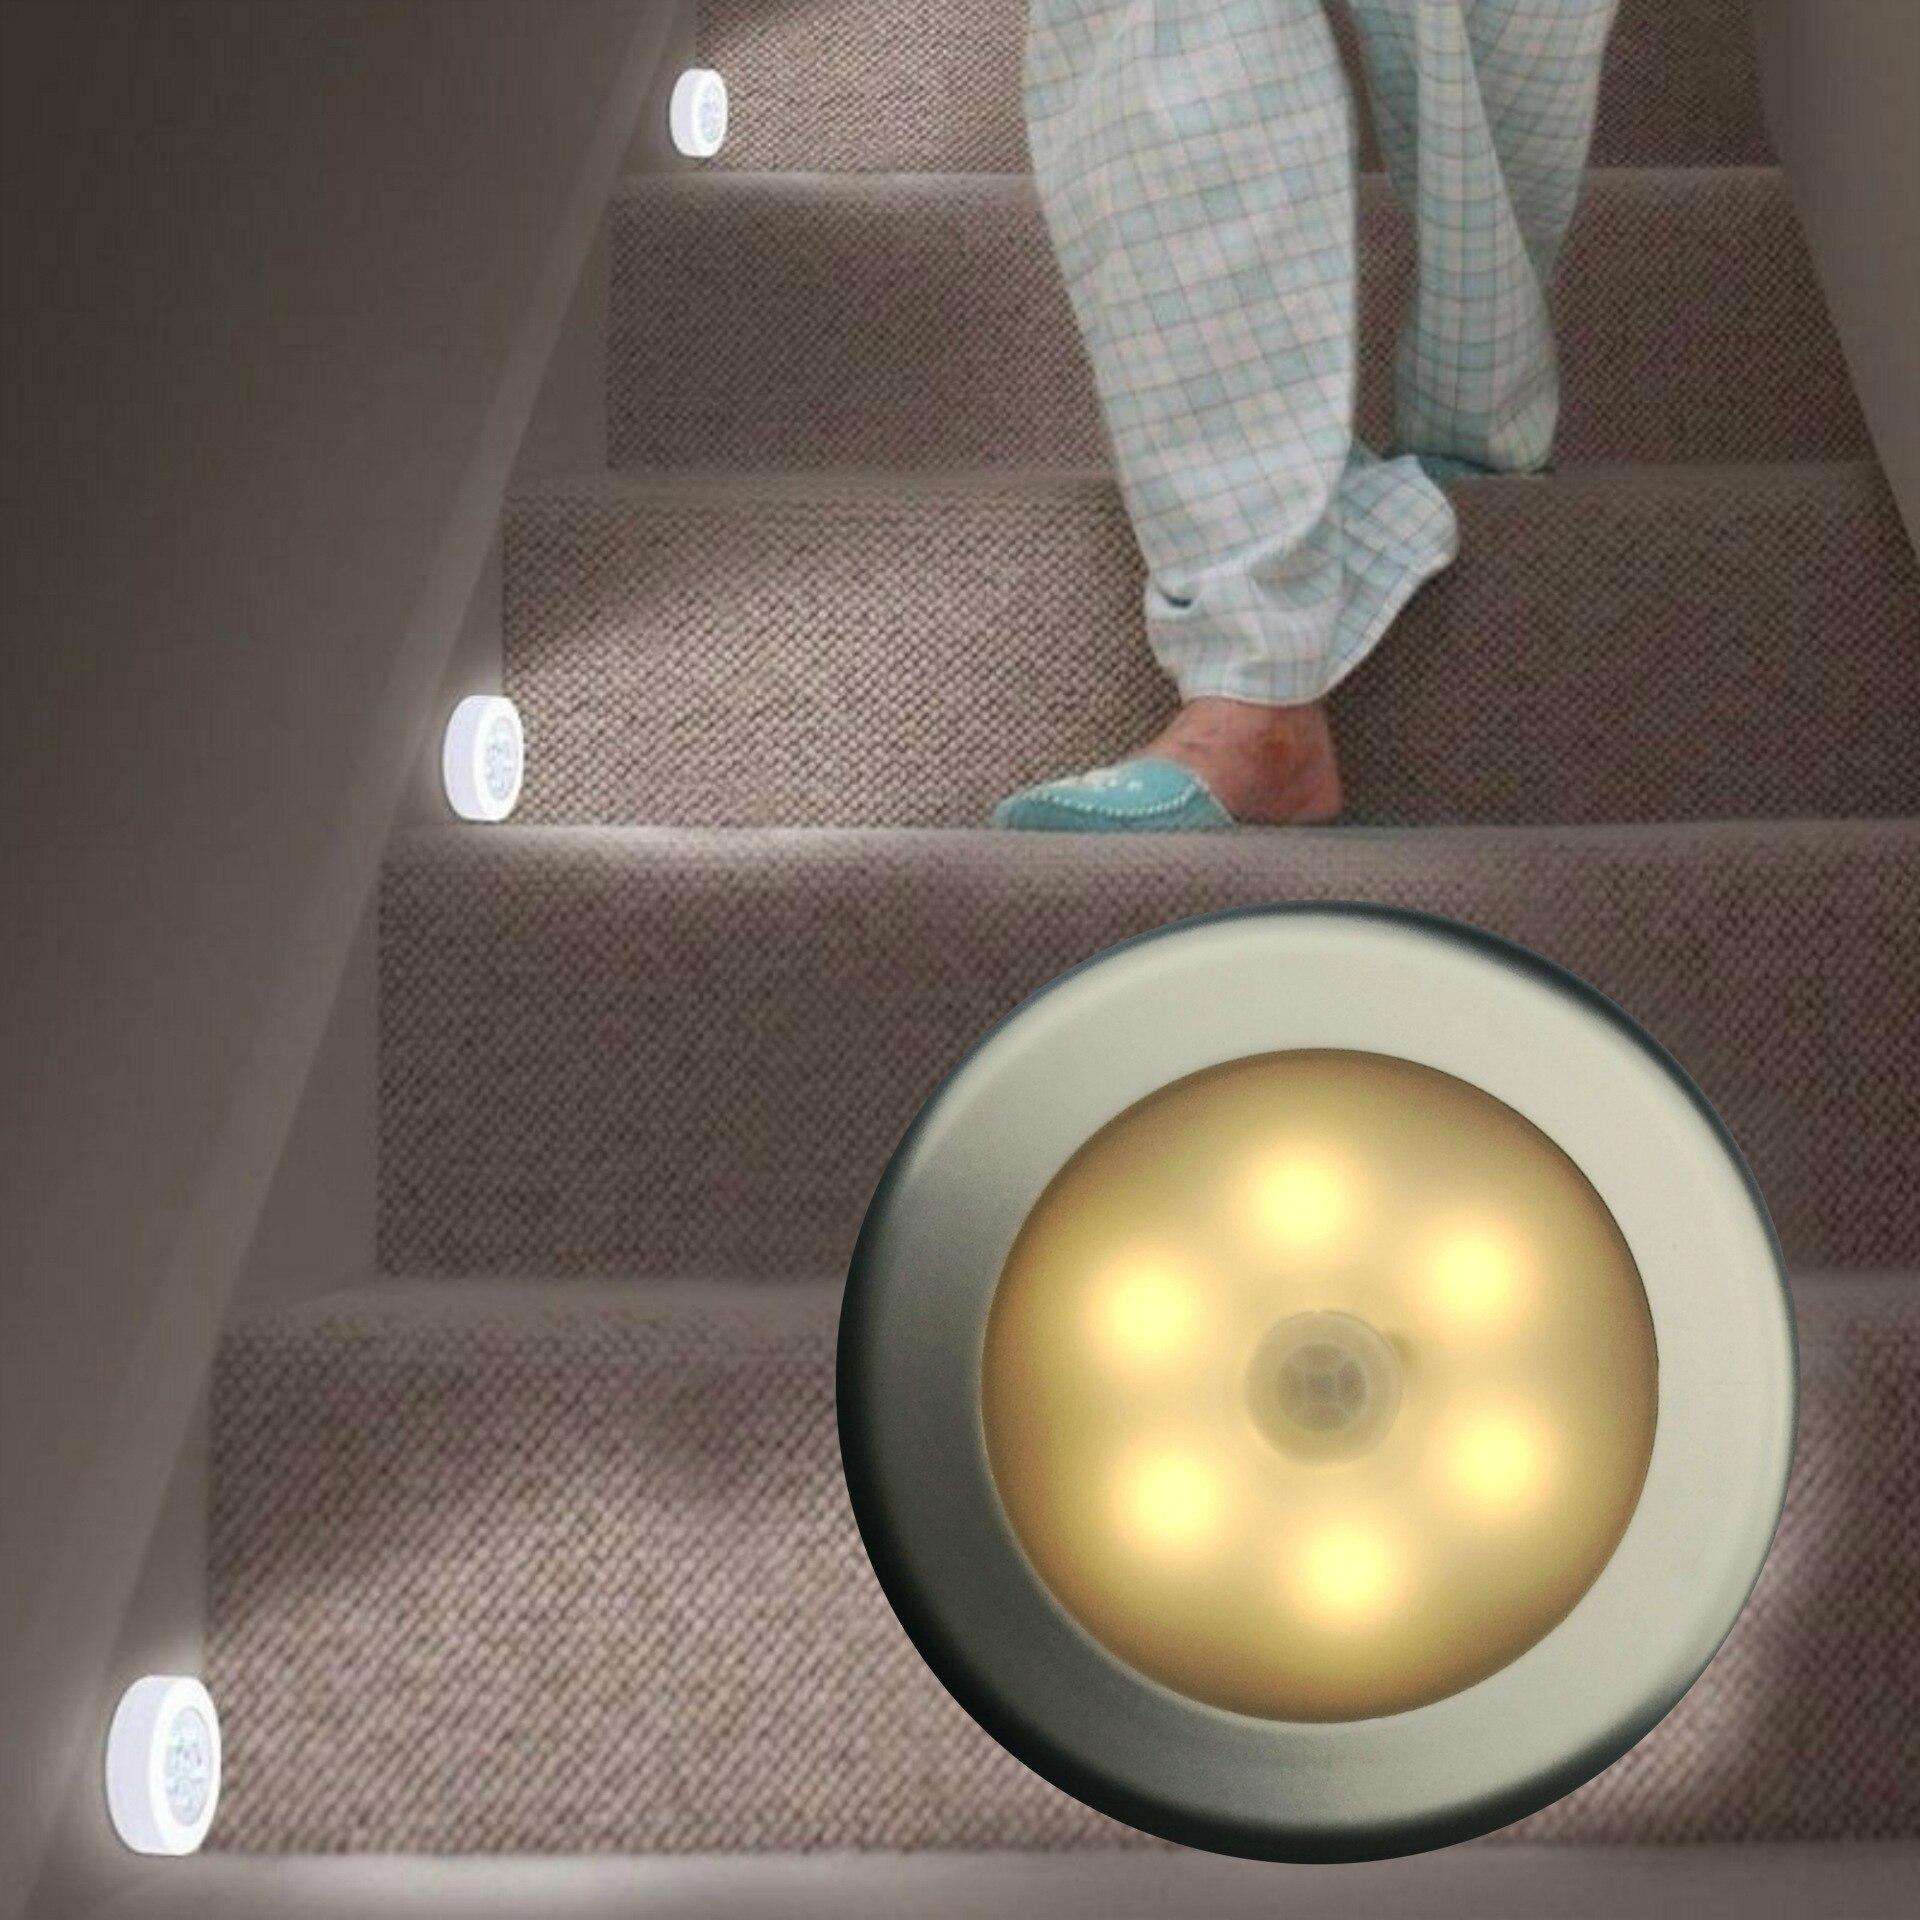 AIMIHUO Intelligent body sensor light smart toilet night light LED Light with motion sensor Corridor sensor lights 2 colors